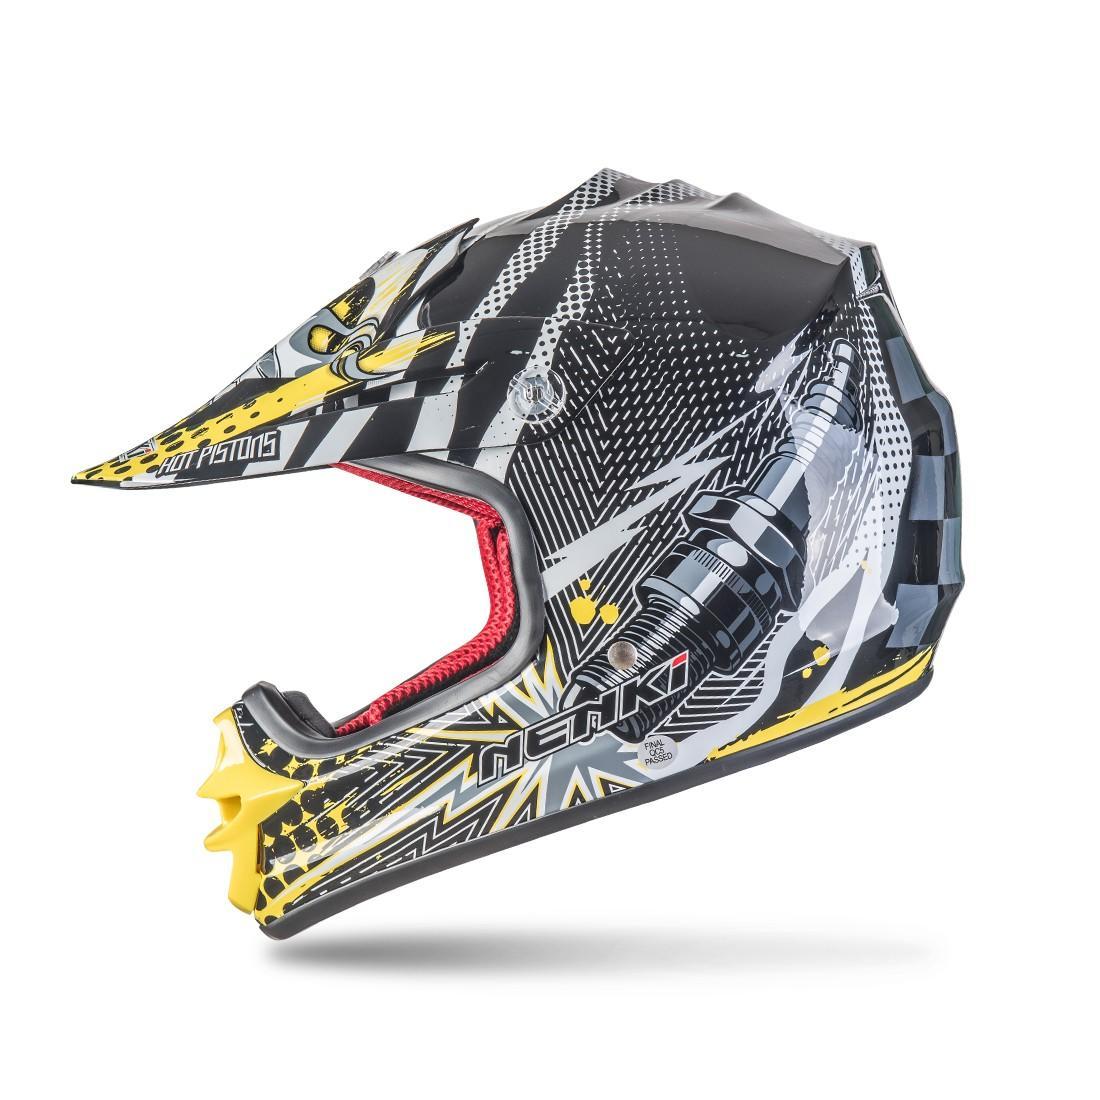 colorful Comfortable motocross helmets for sale Adult wholesale Nenki company